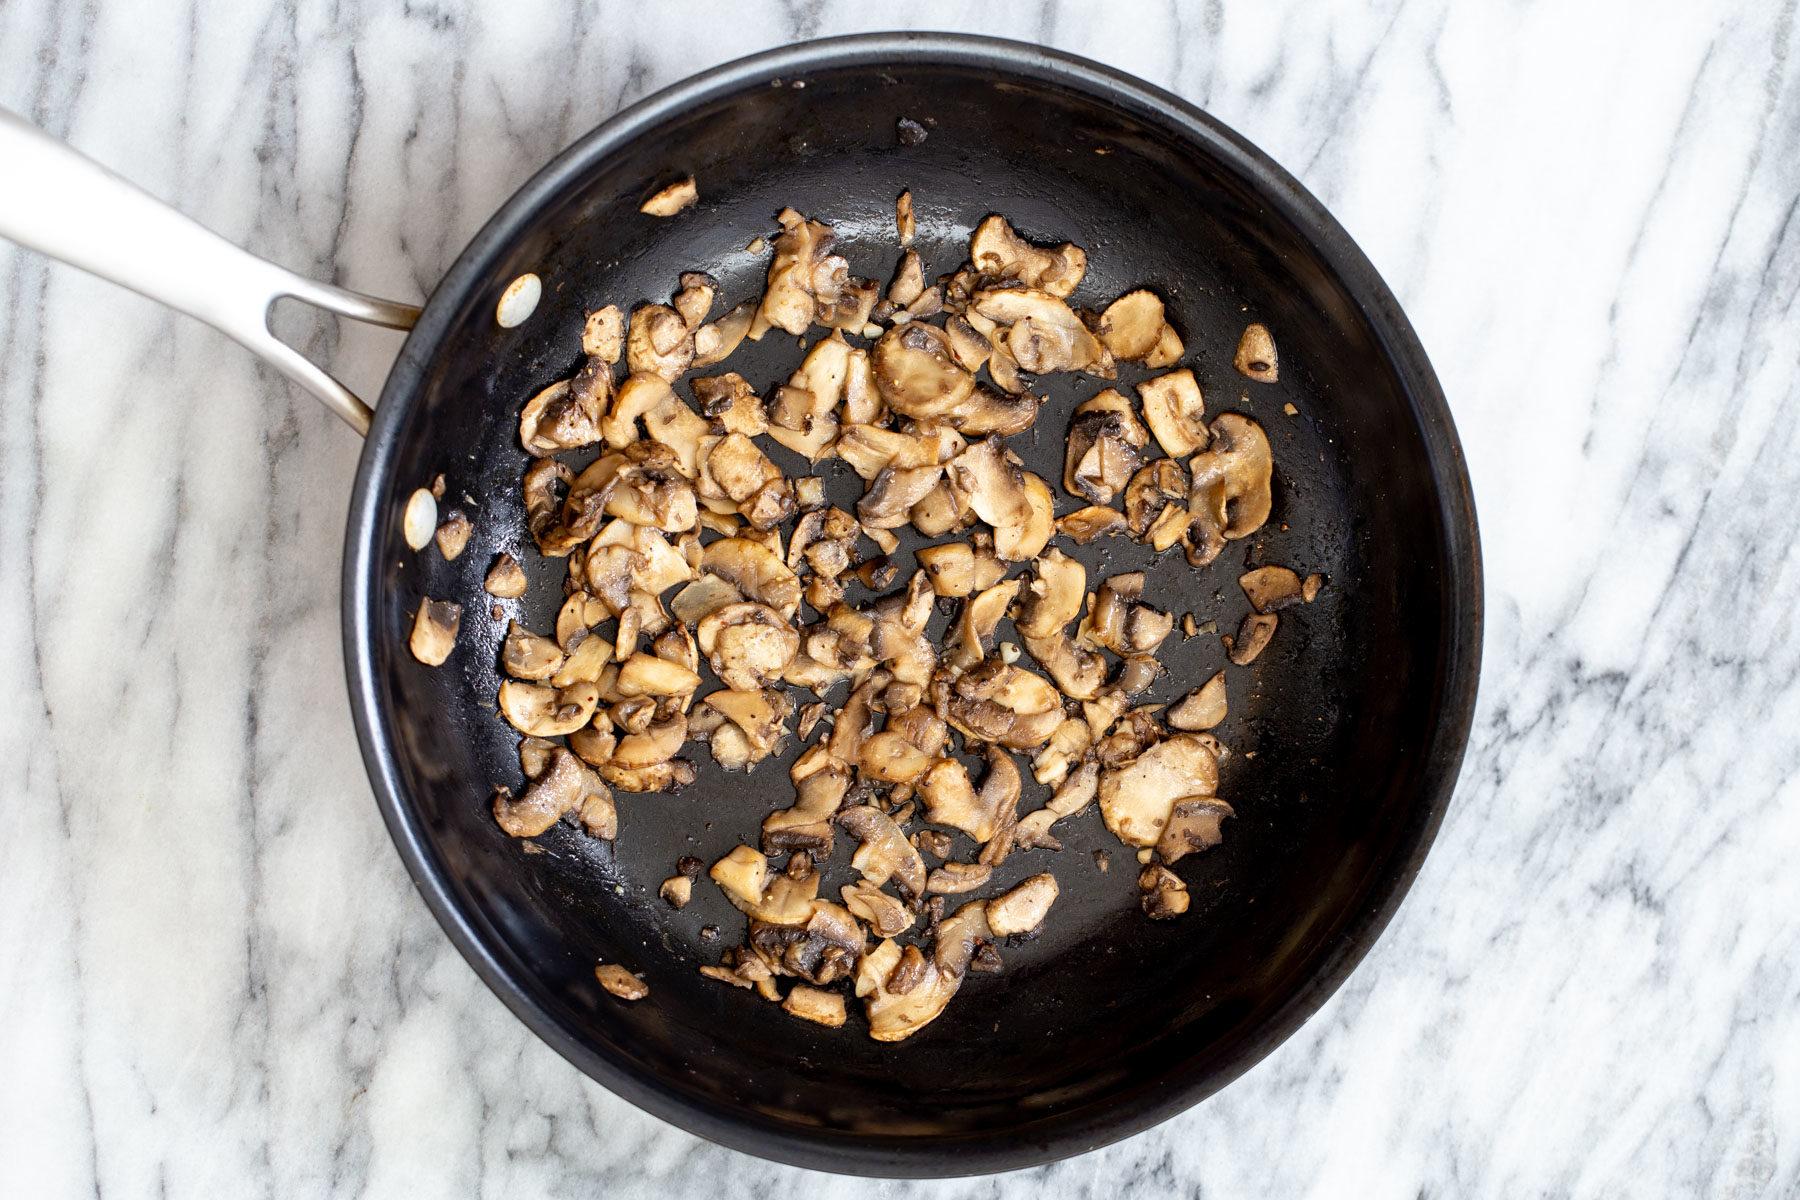 sauteed mushrooms in a frying pan